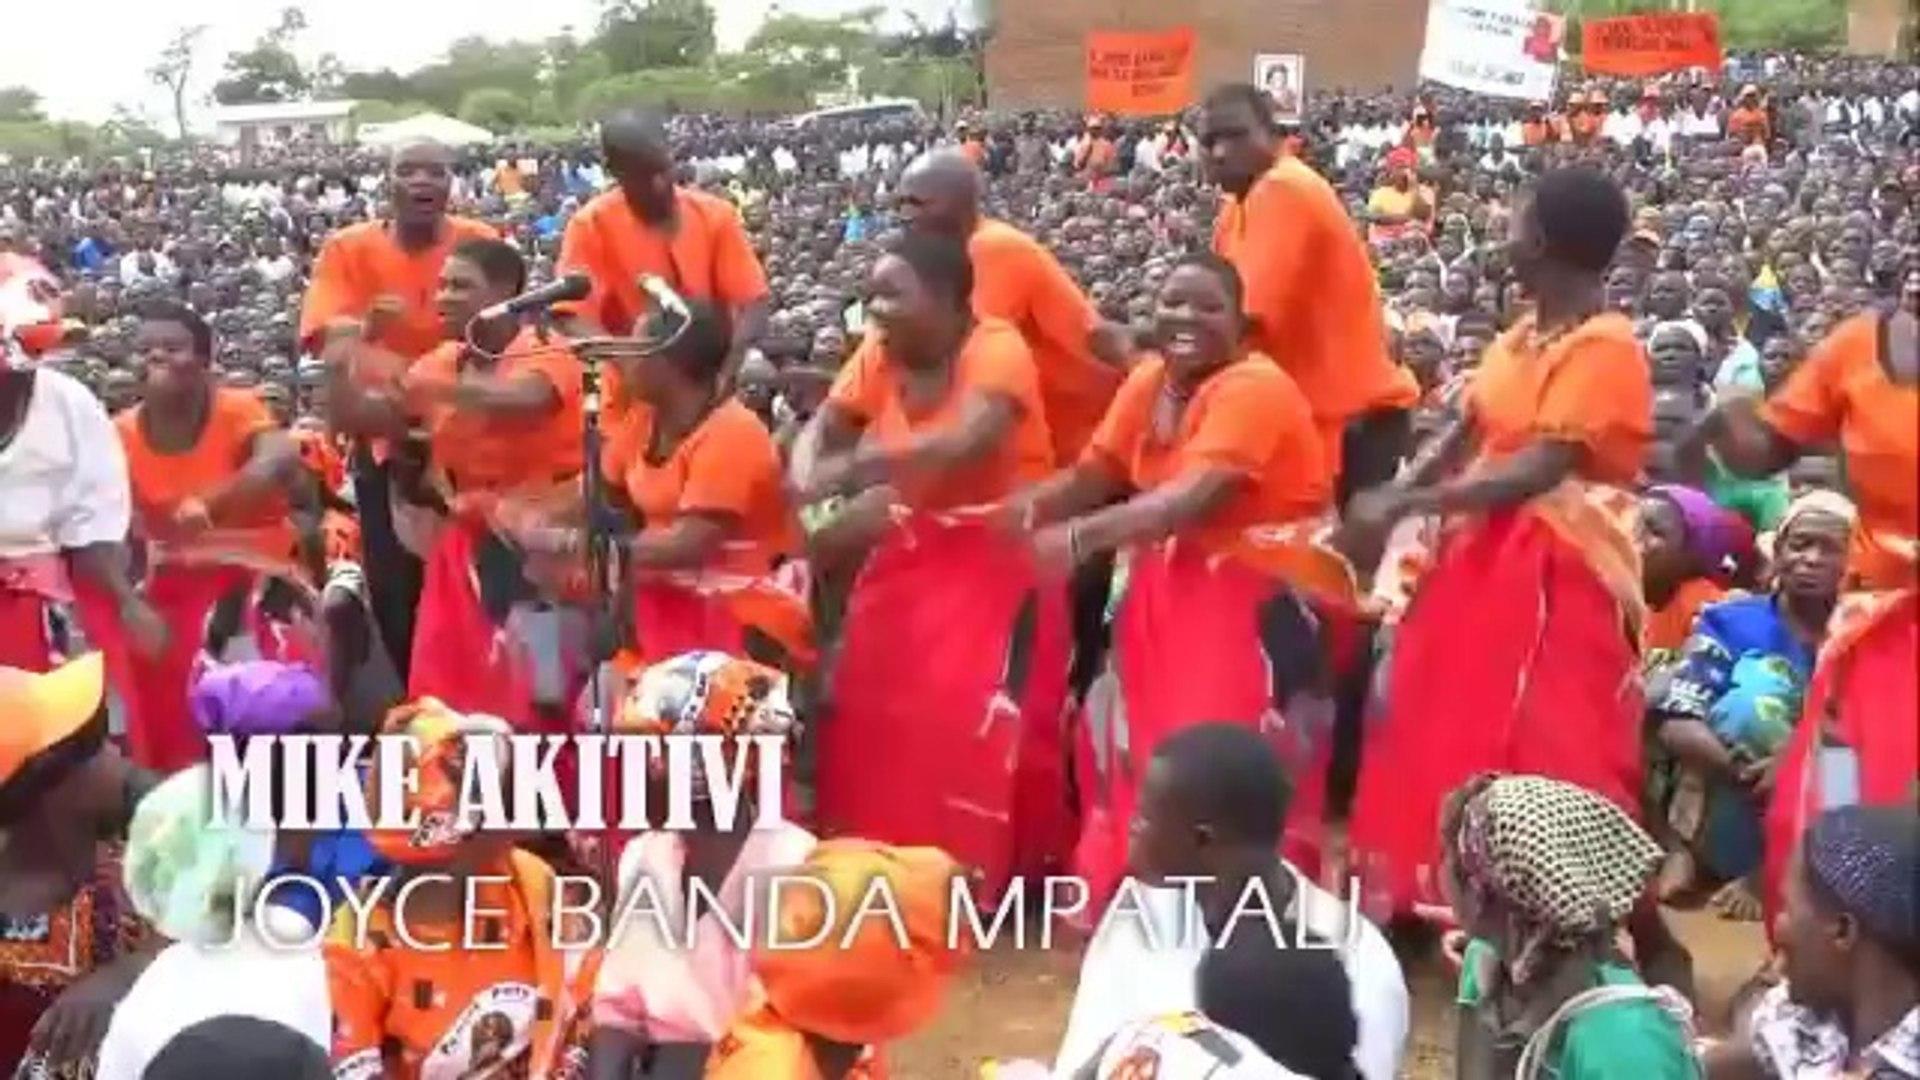 Joyce Banda Son Mpatali Official Video Of  Roy Kachale Banda